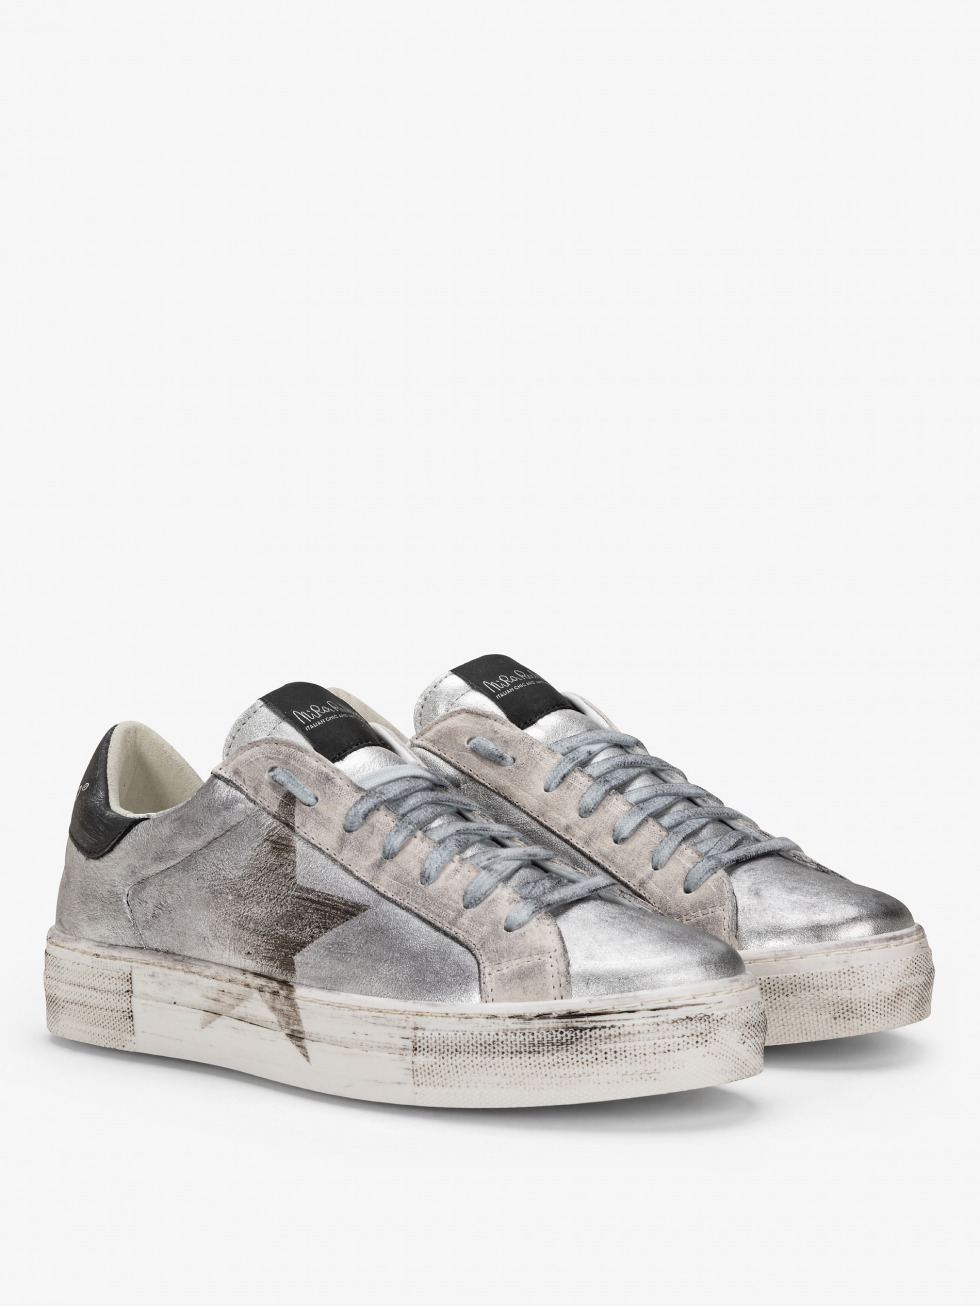 sneakers-in-pelle-donna-martini-vintage-silver-stella (1)